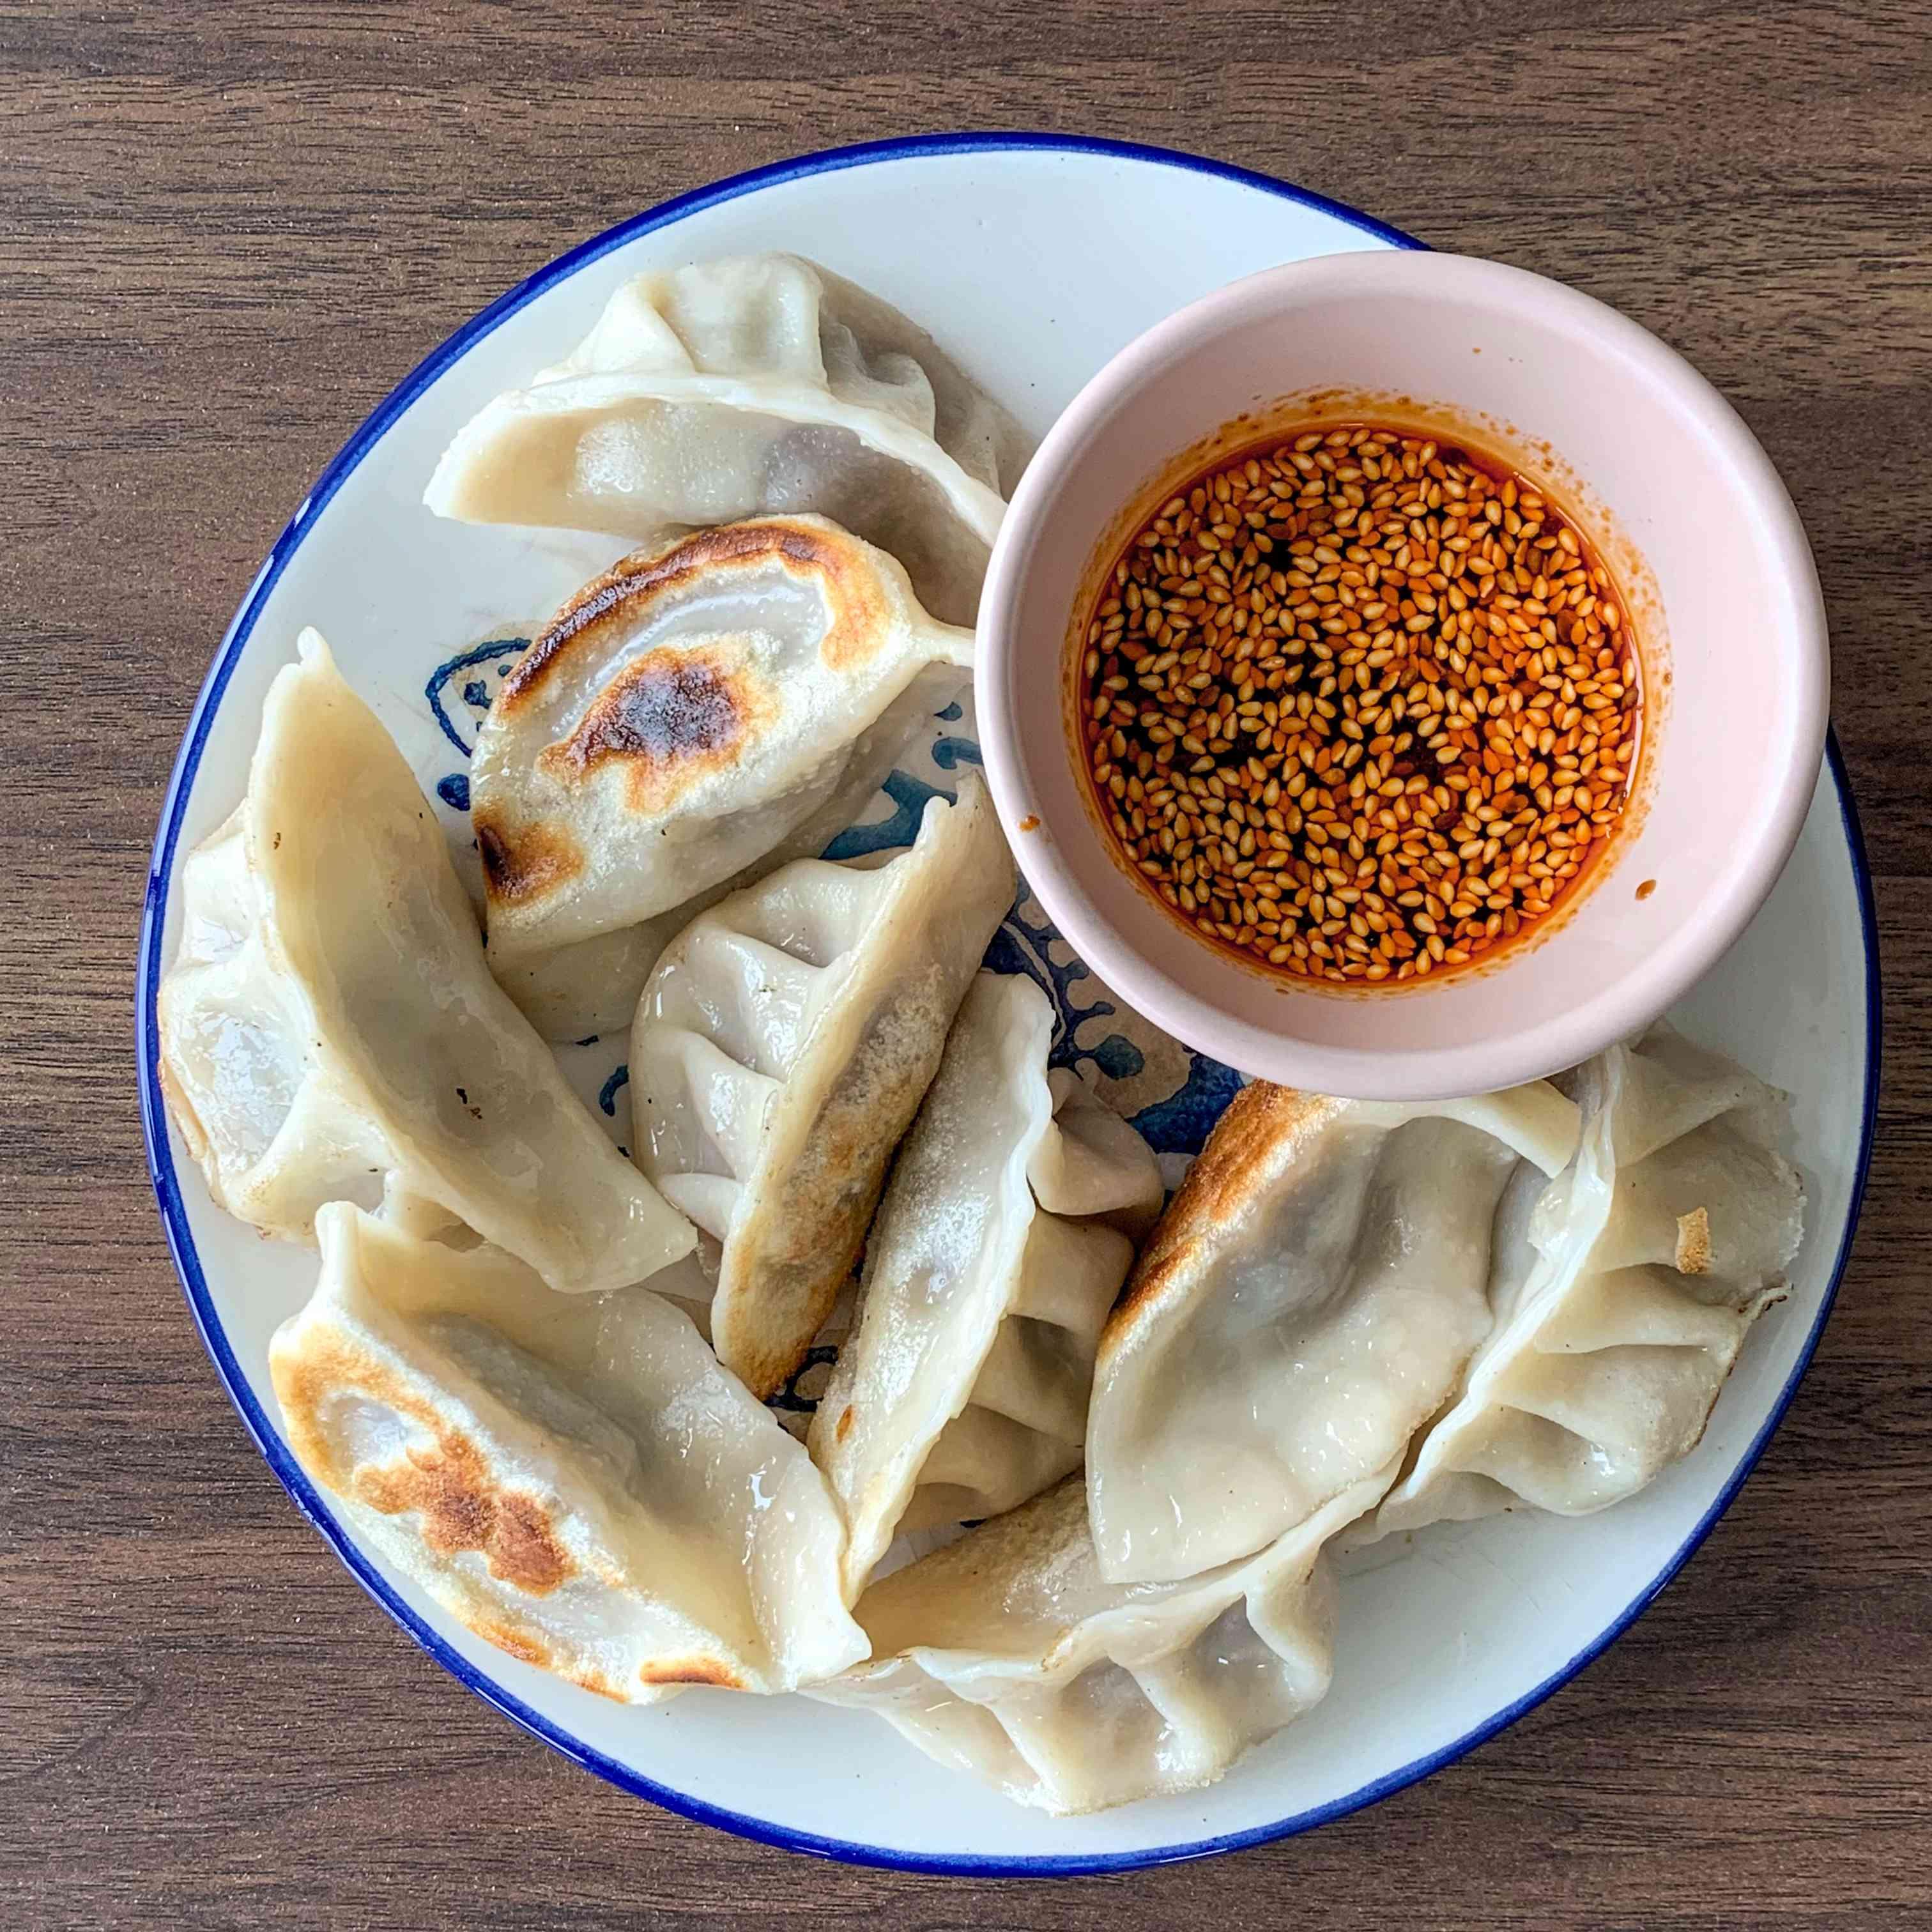 Korean Dumpling Tester Image